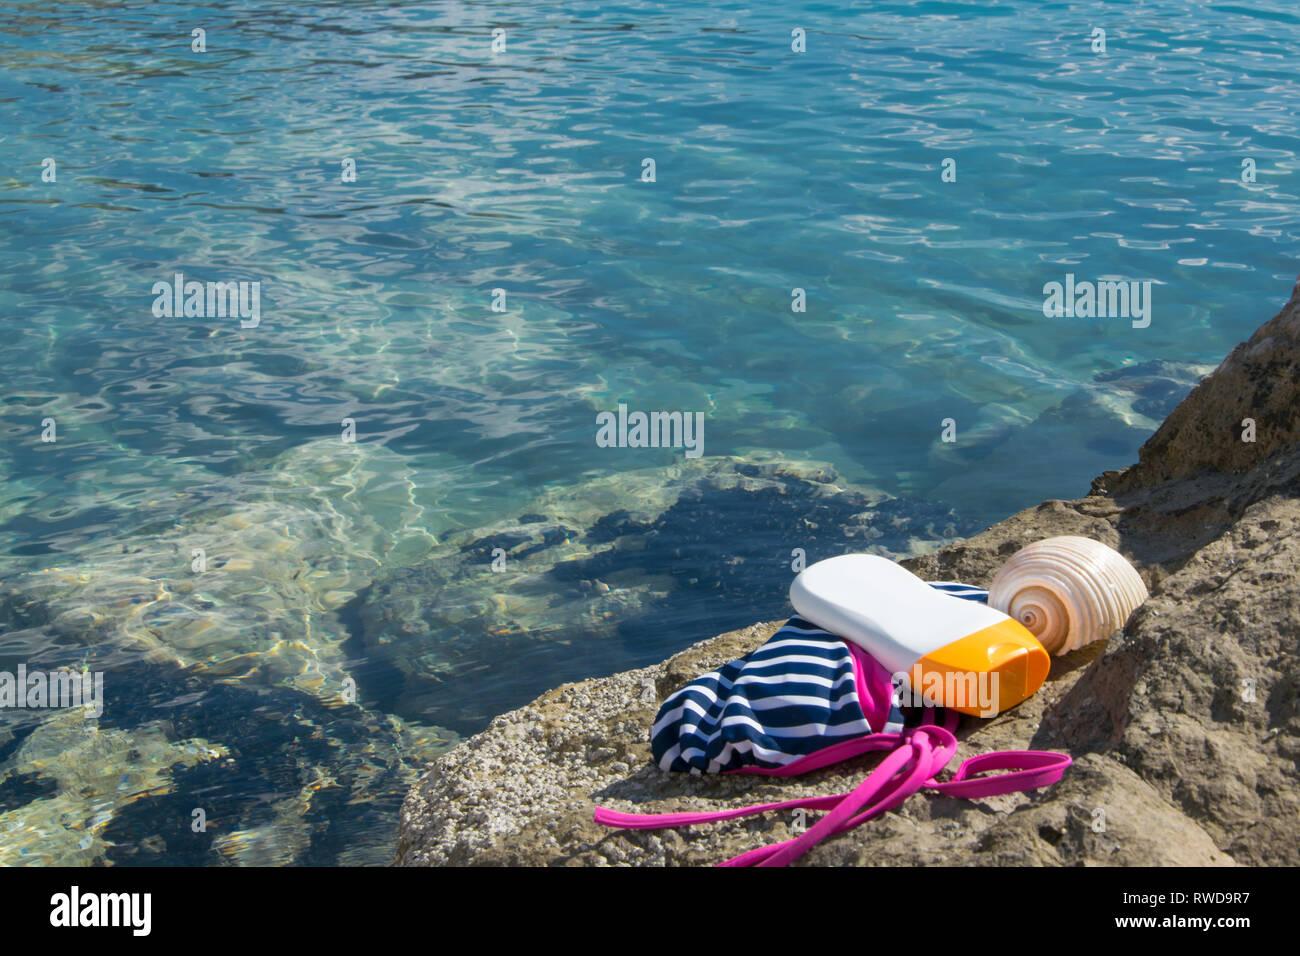 Beach items - swimwear, sun protection cream and a shell on a seashore rock - Stock Image